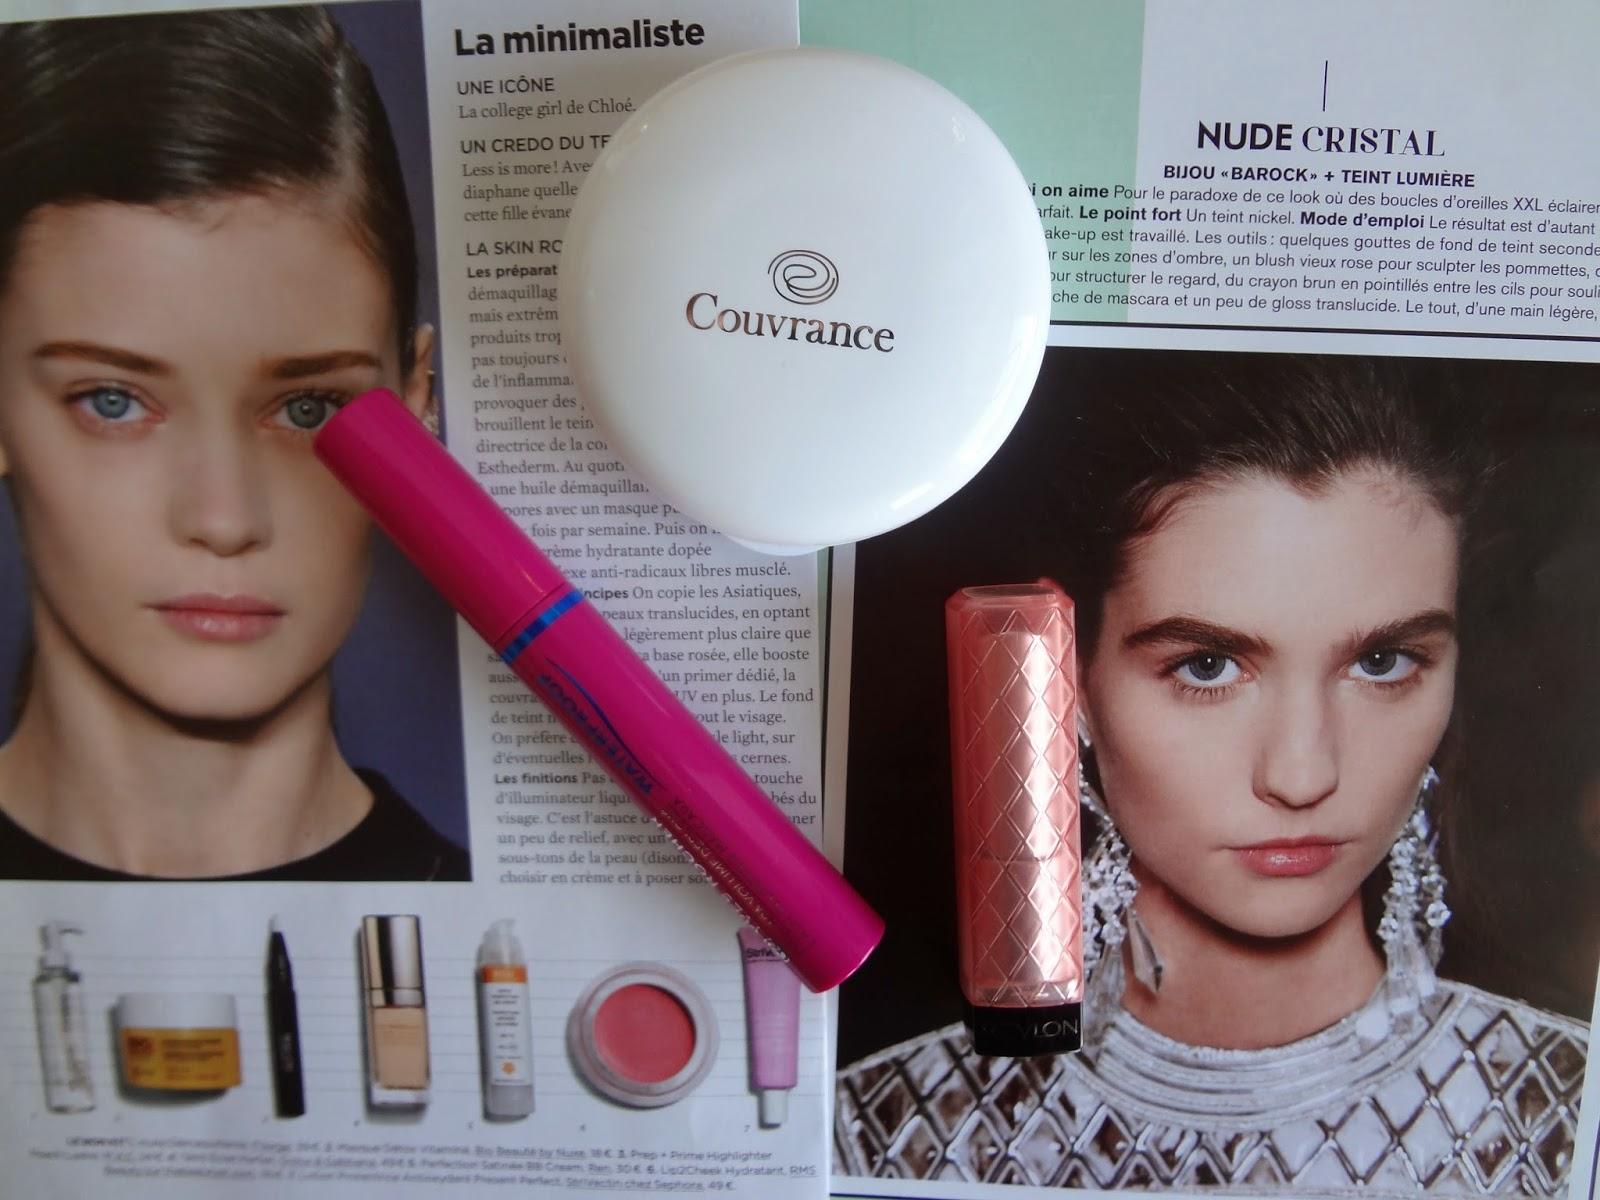 routine-make-up-maquillage-simple-facile-couvrance-avene-oil-free-compact-fond-teint-foundation-naturel-mascara-waterproof-yves-rocher-volume-deploye-revlon-lipbutter-peach-parfait-baume-teinte-ete-summer